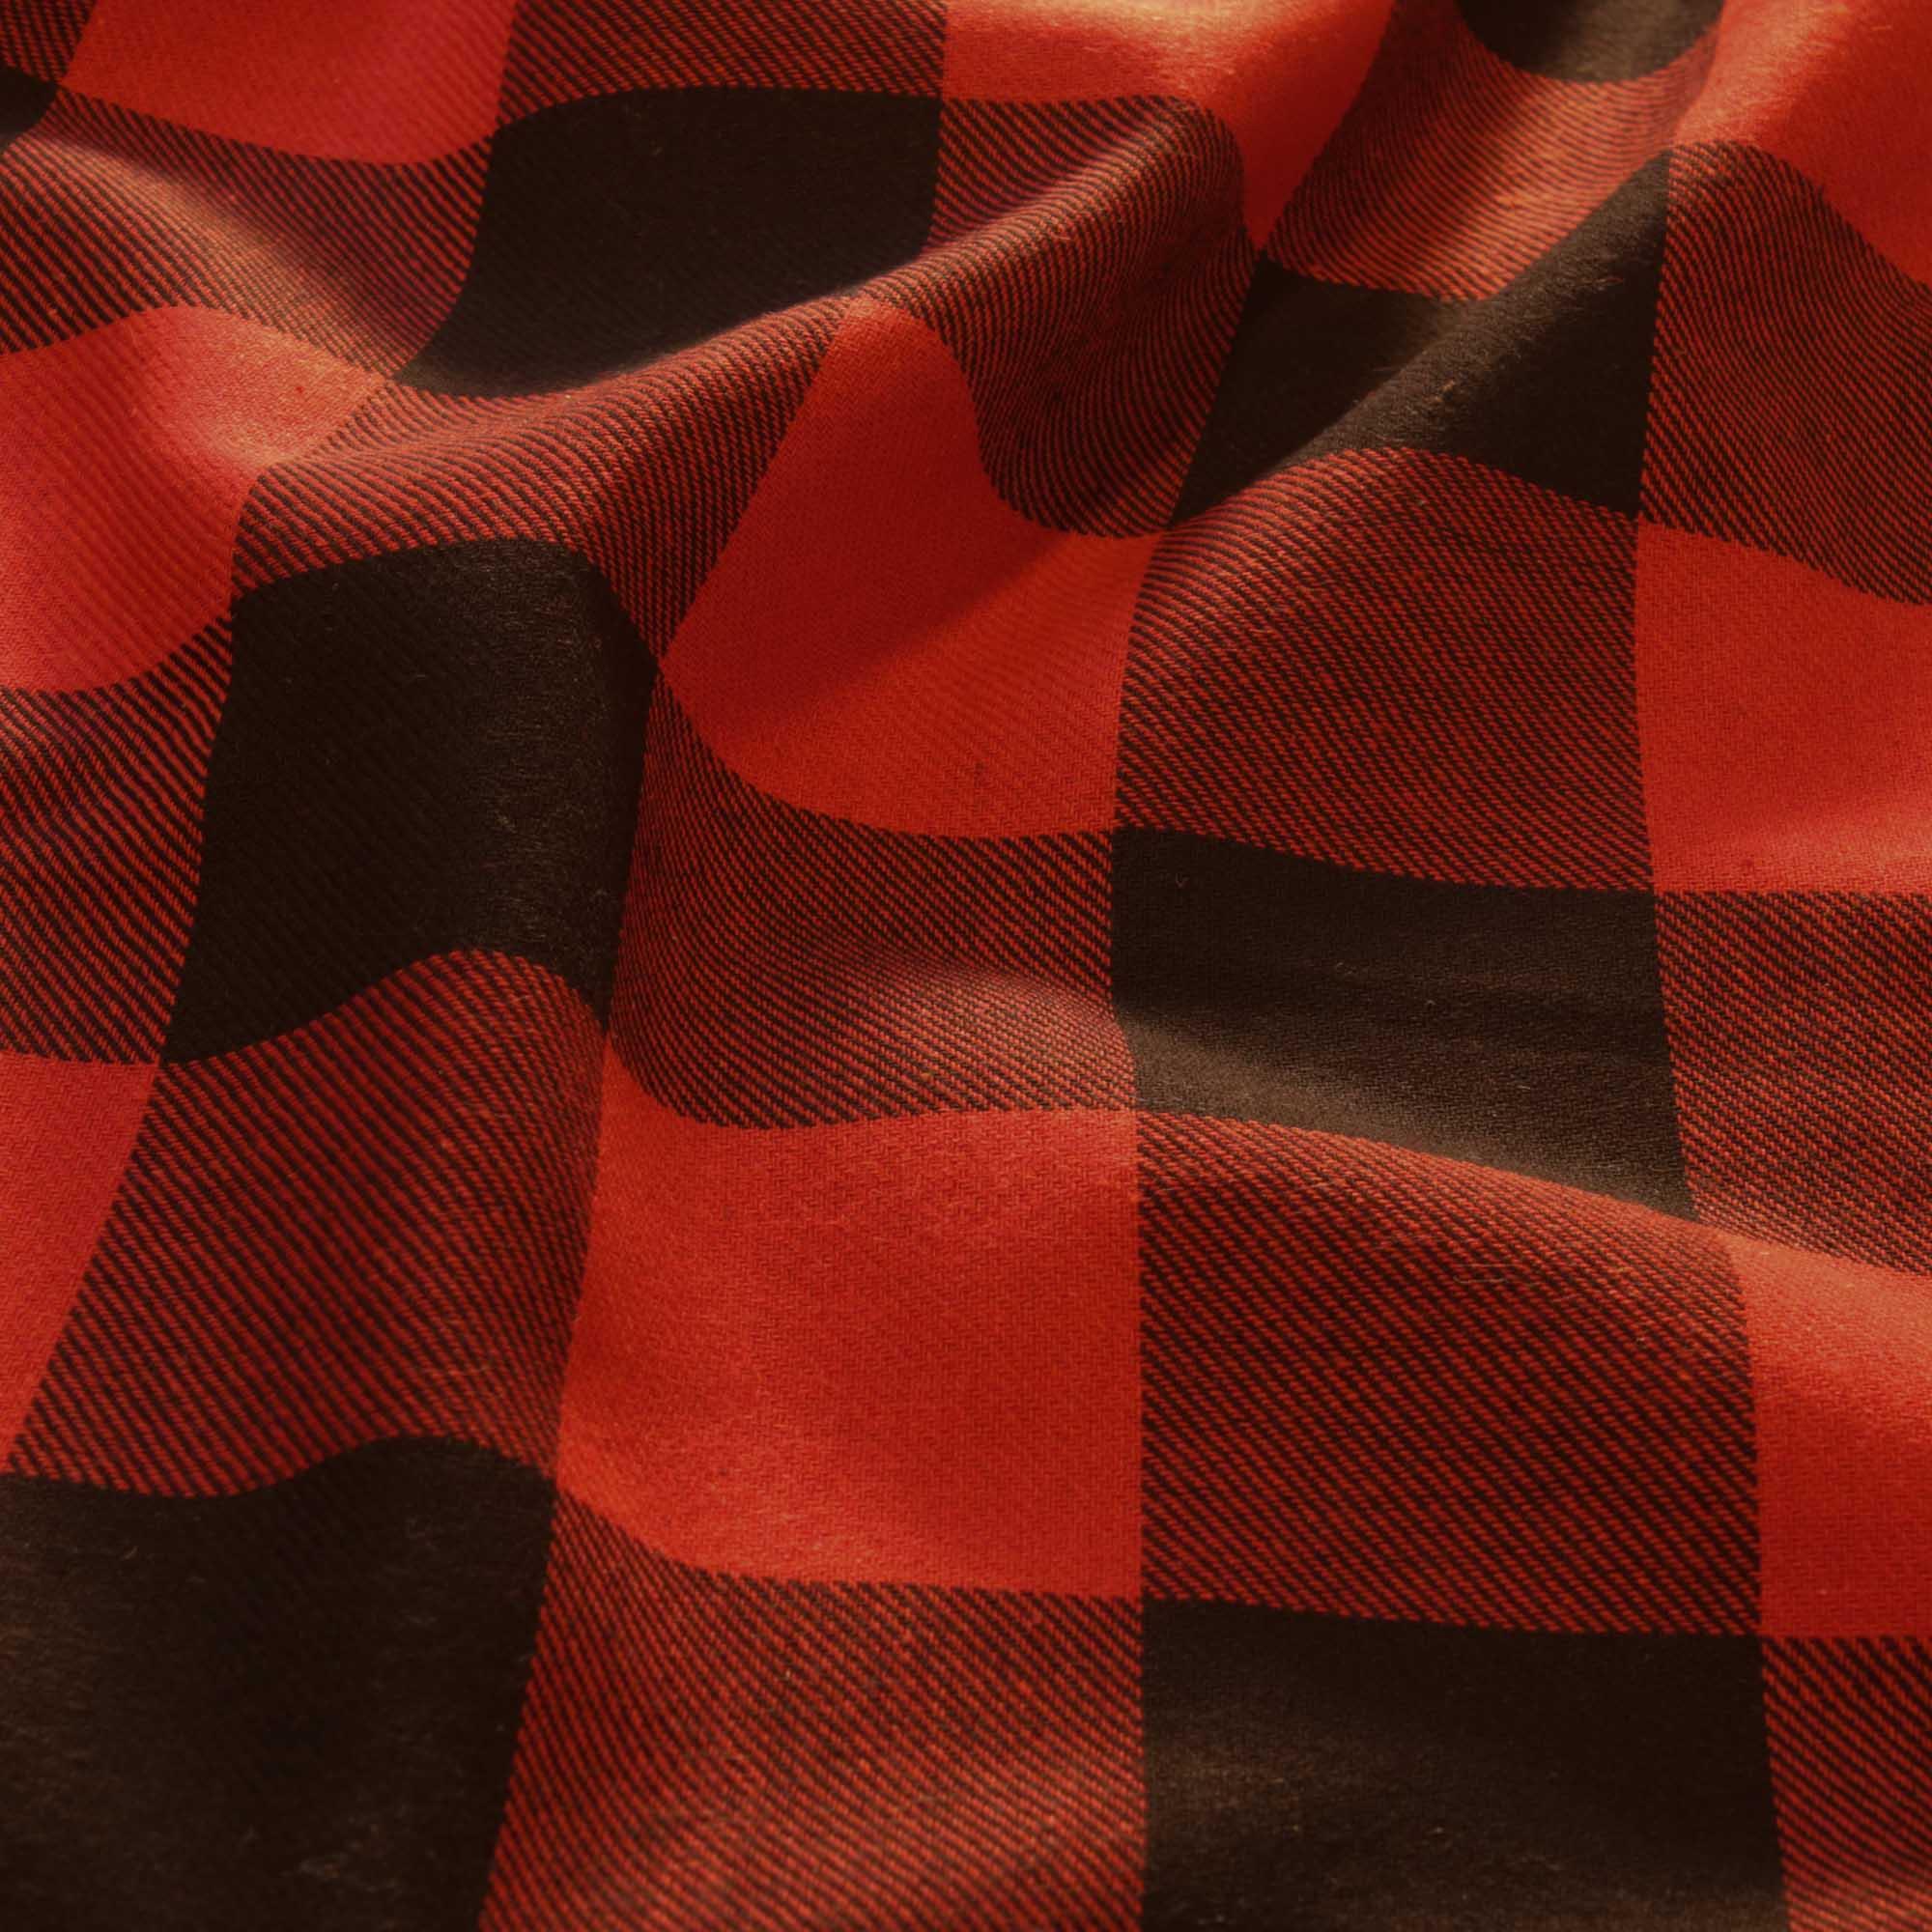 Tecido Flanela Xadrez 1,40 Mt Largura Vermelho/Preto